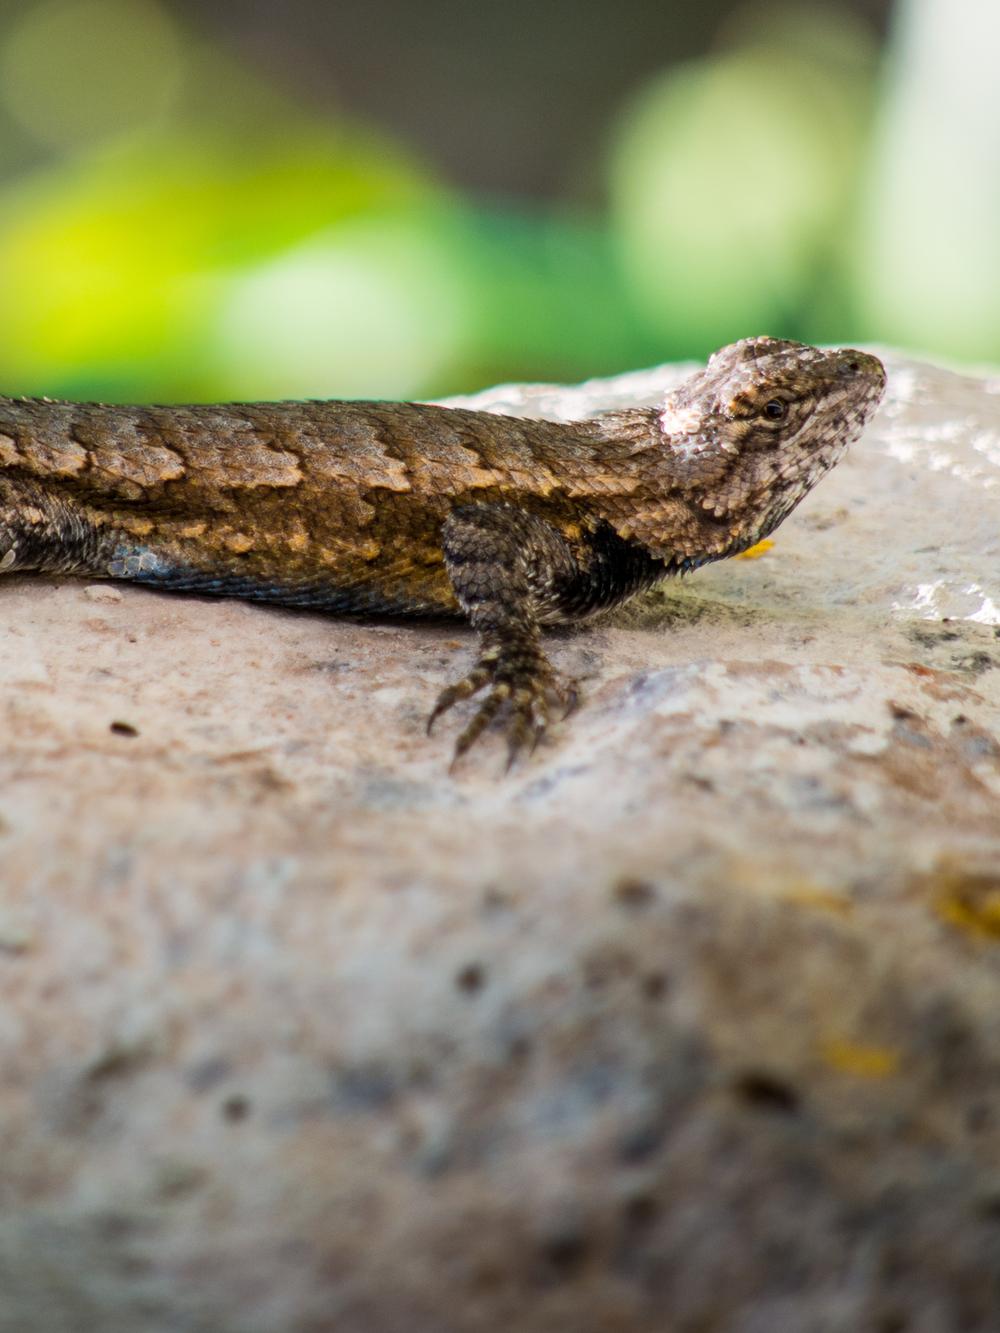 Lizard - Olympus OM-D E-M5, 200mm, f/5.6, ISO 320, 1/250sec